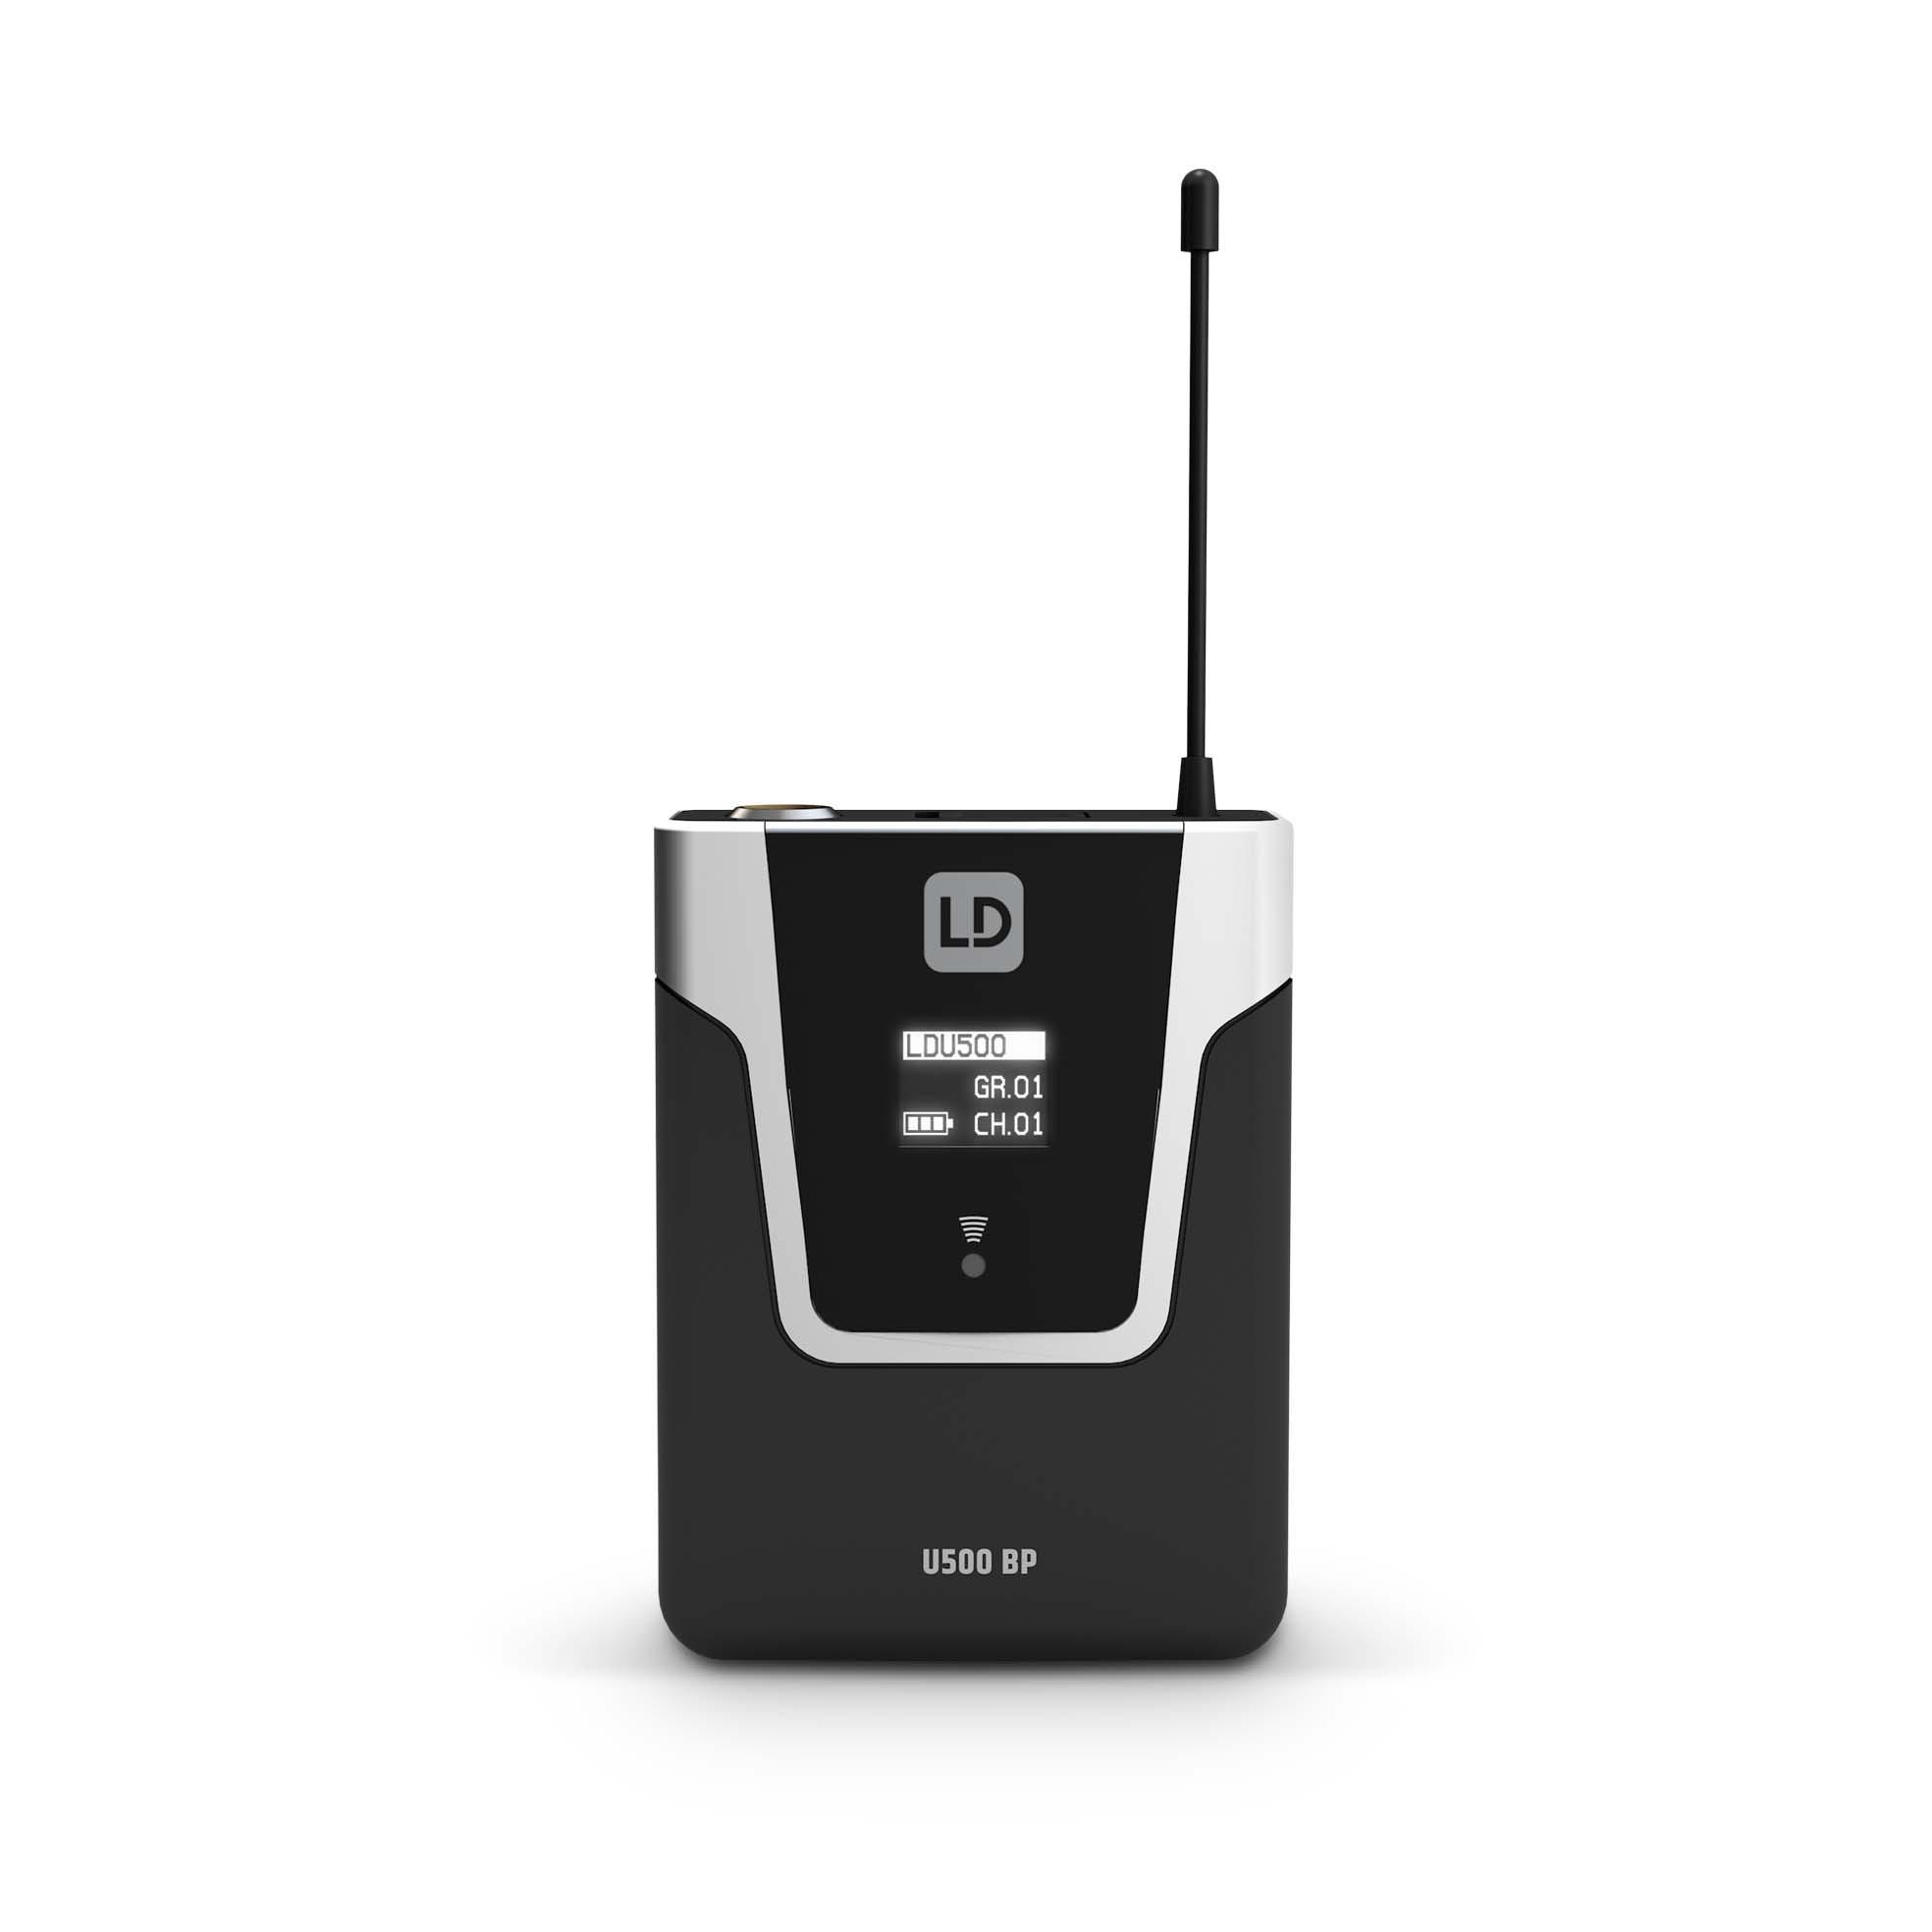 U508 BPHH 2 Funkmikrofon System mit 2 x Bodypack und 2 x Headset beigefarben